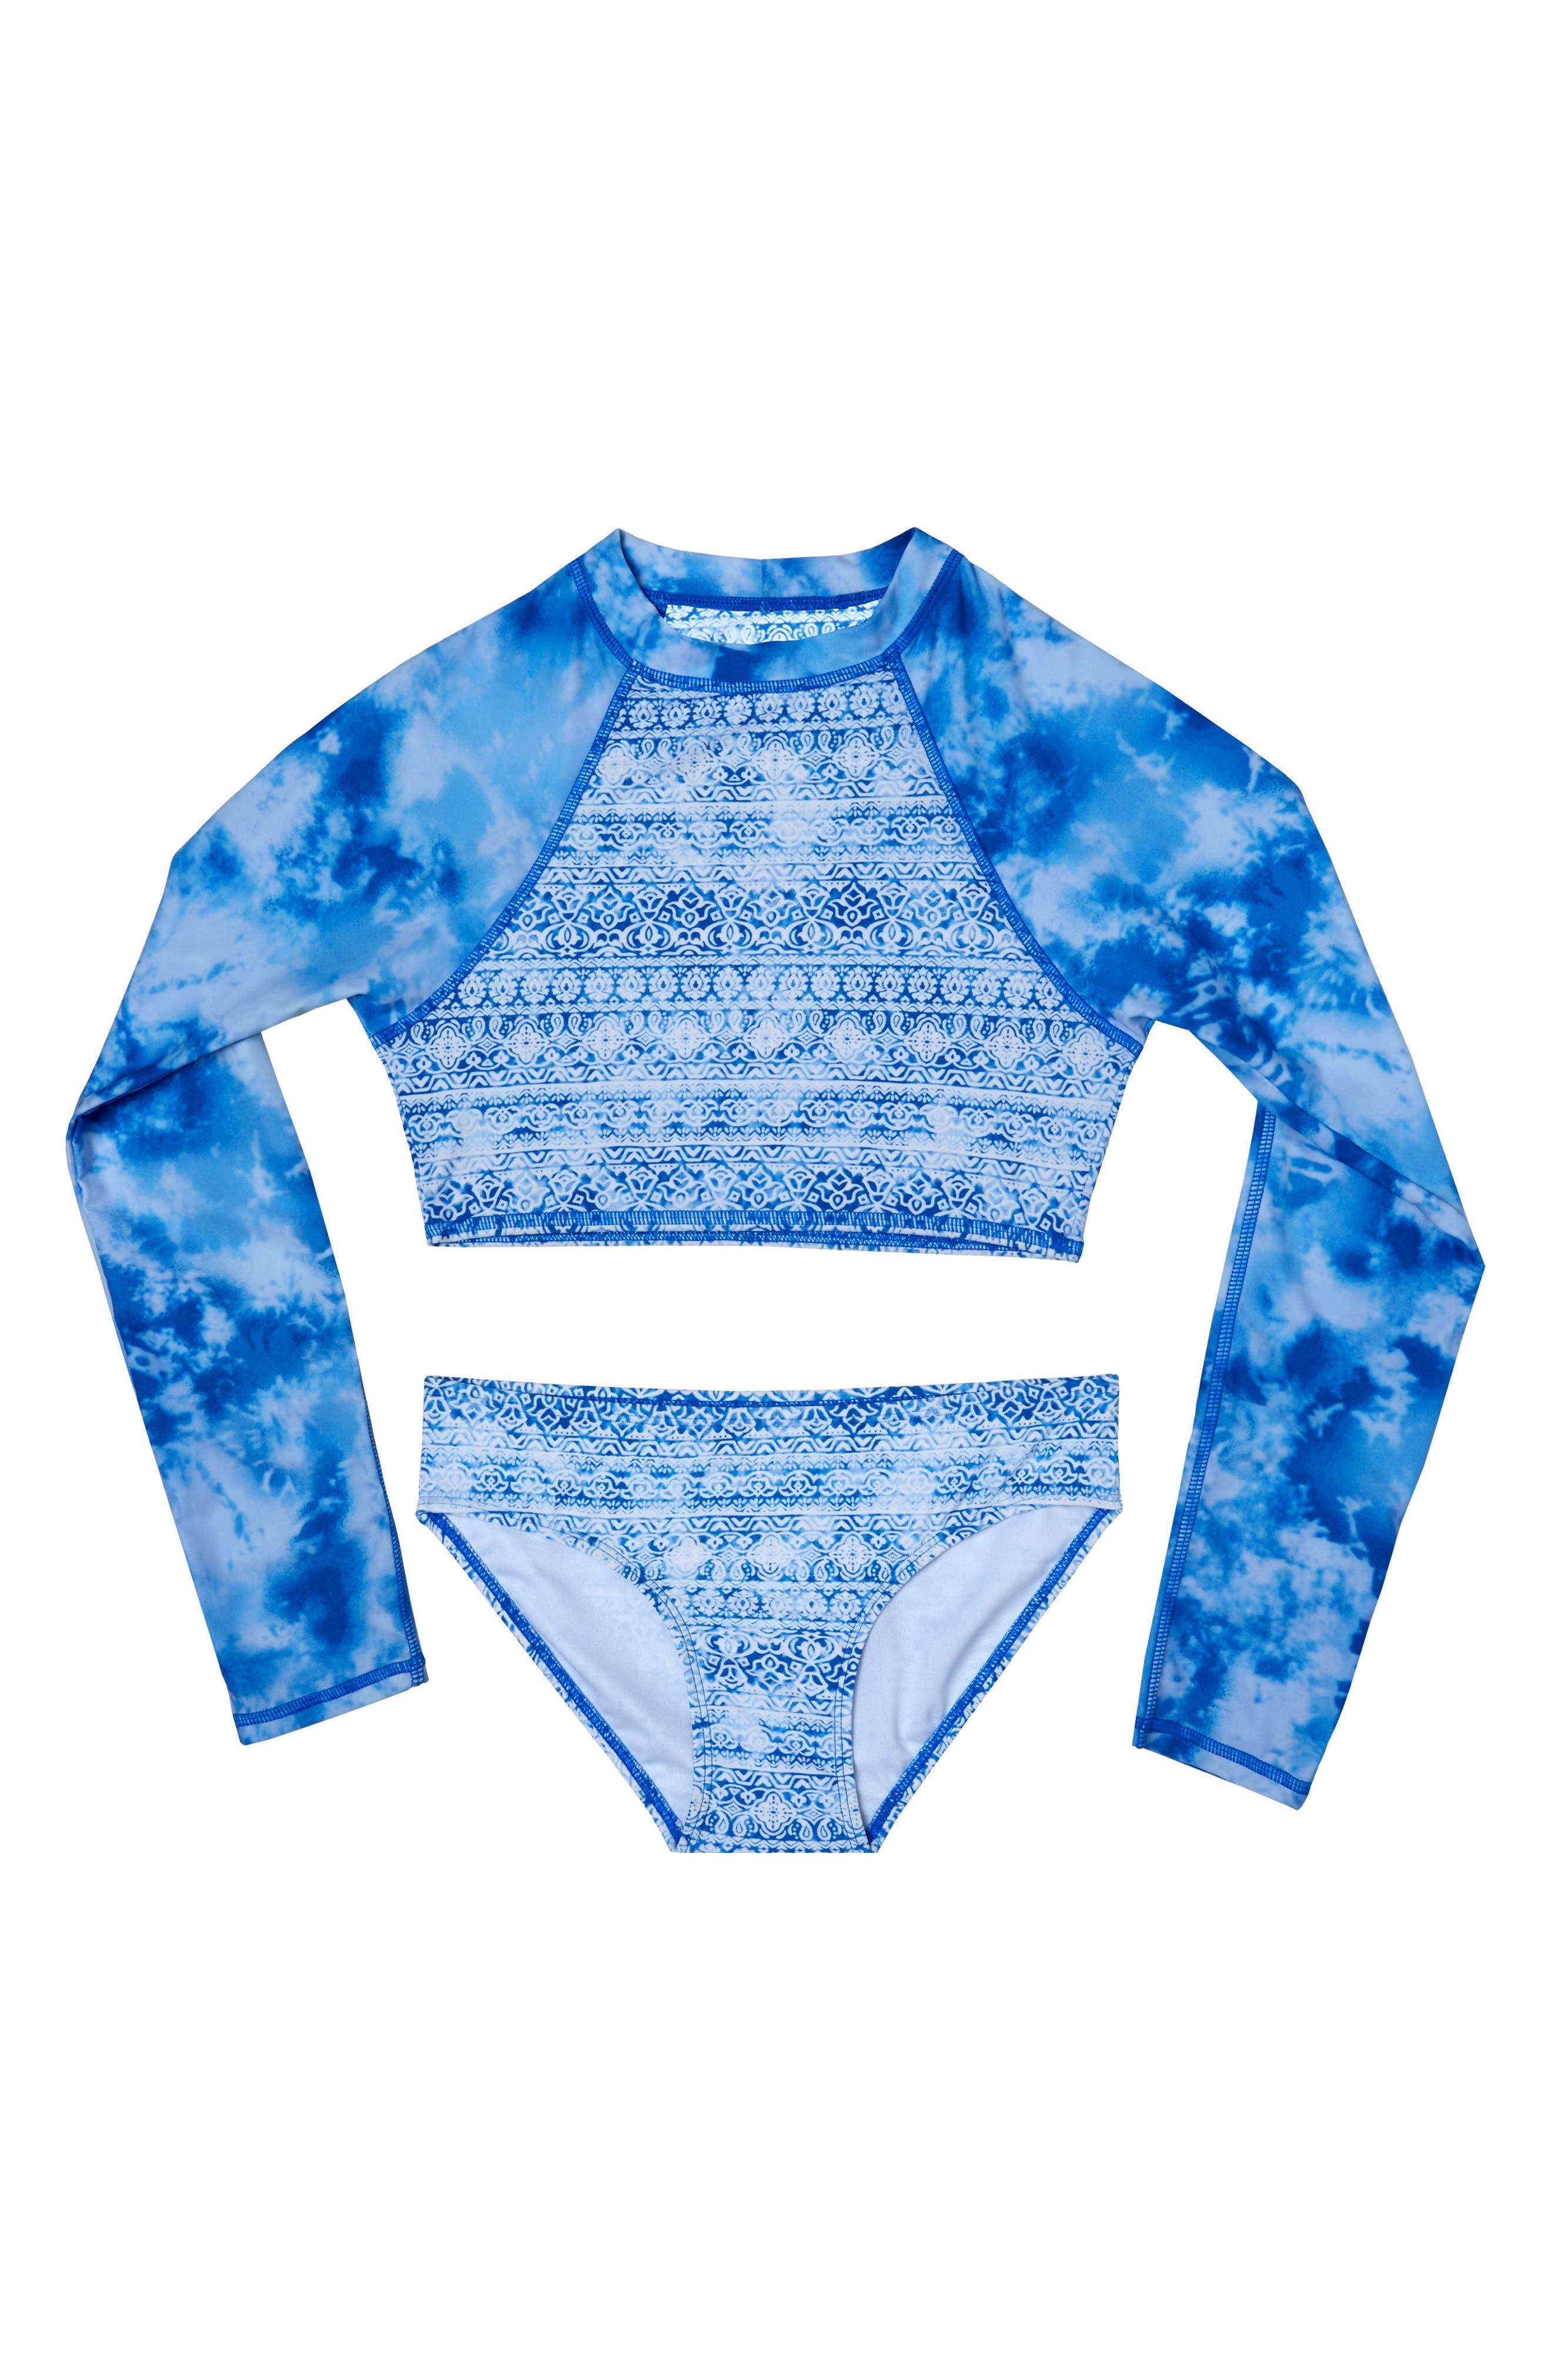 Jeans Addiction Two-Piece Rashguard Swimsuit,                             Main thumbnail 1, color,                             400